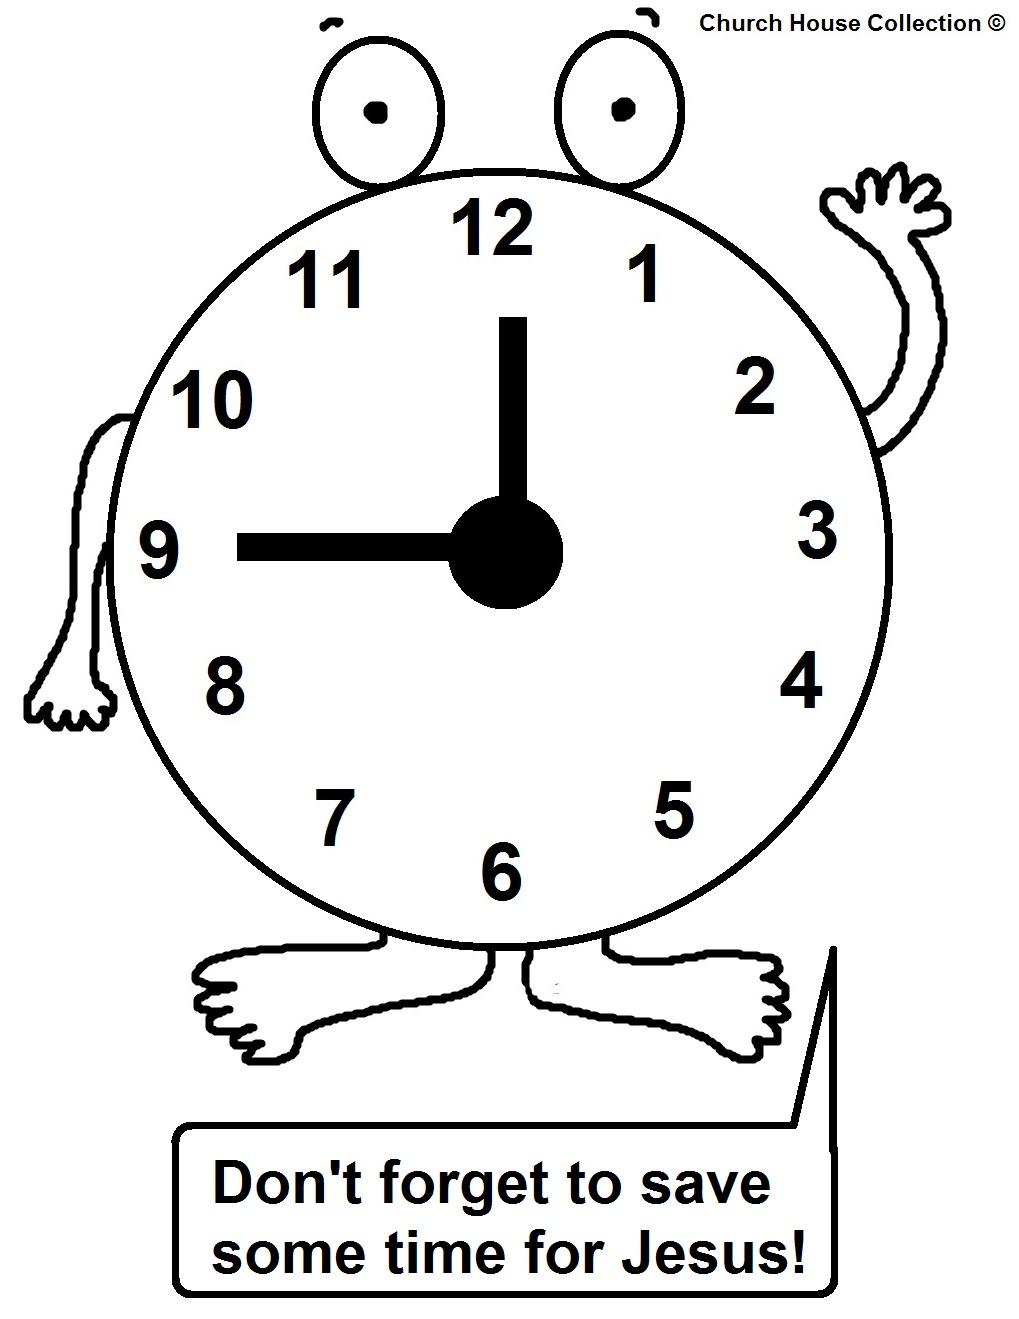 Church House Collection Blog: Daylight Savings Time